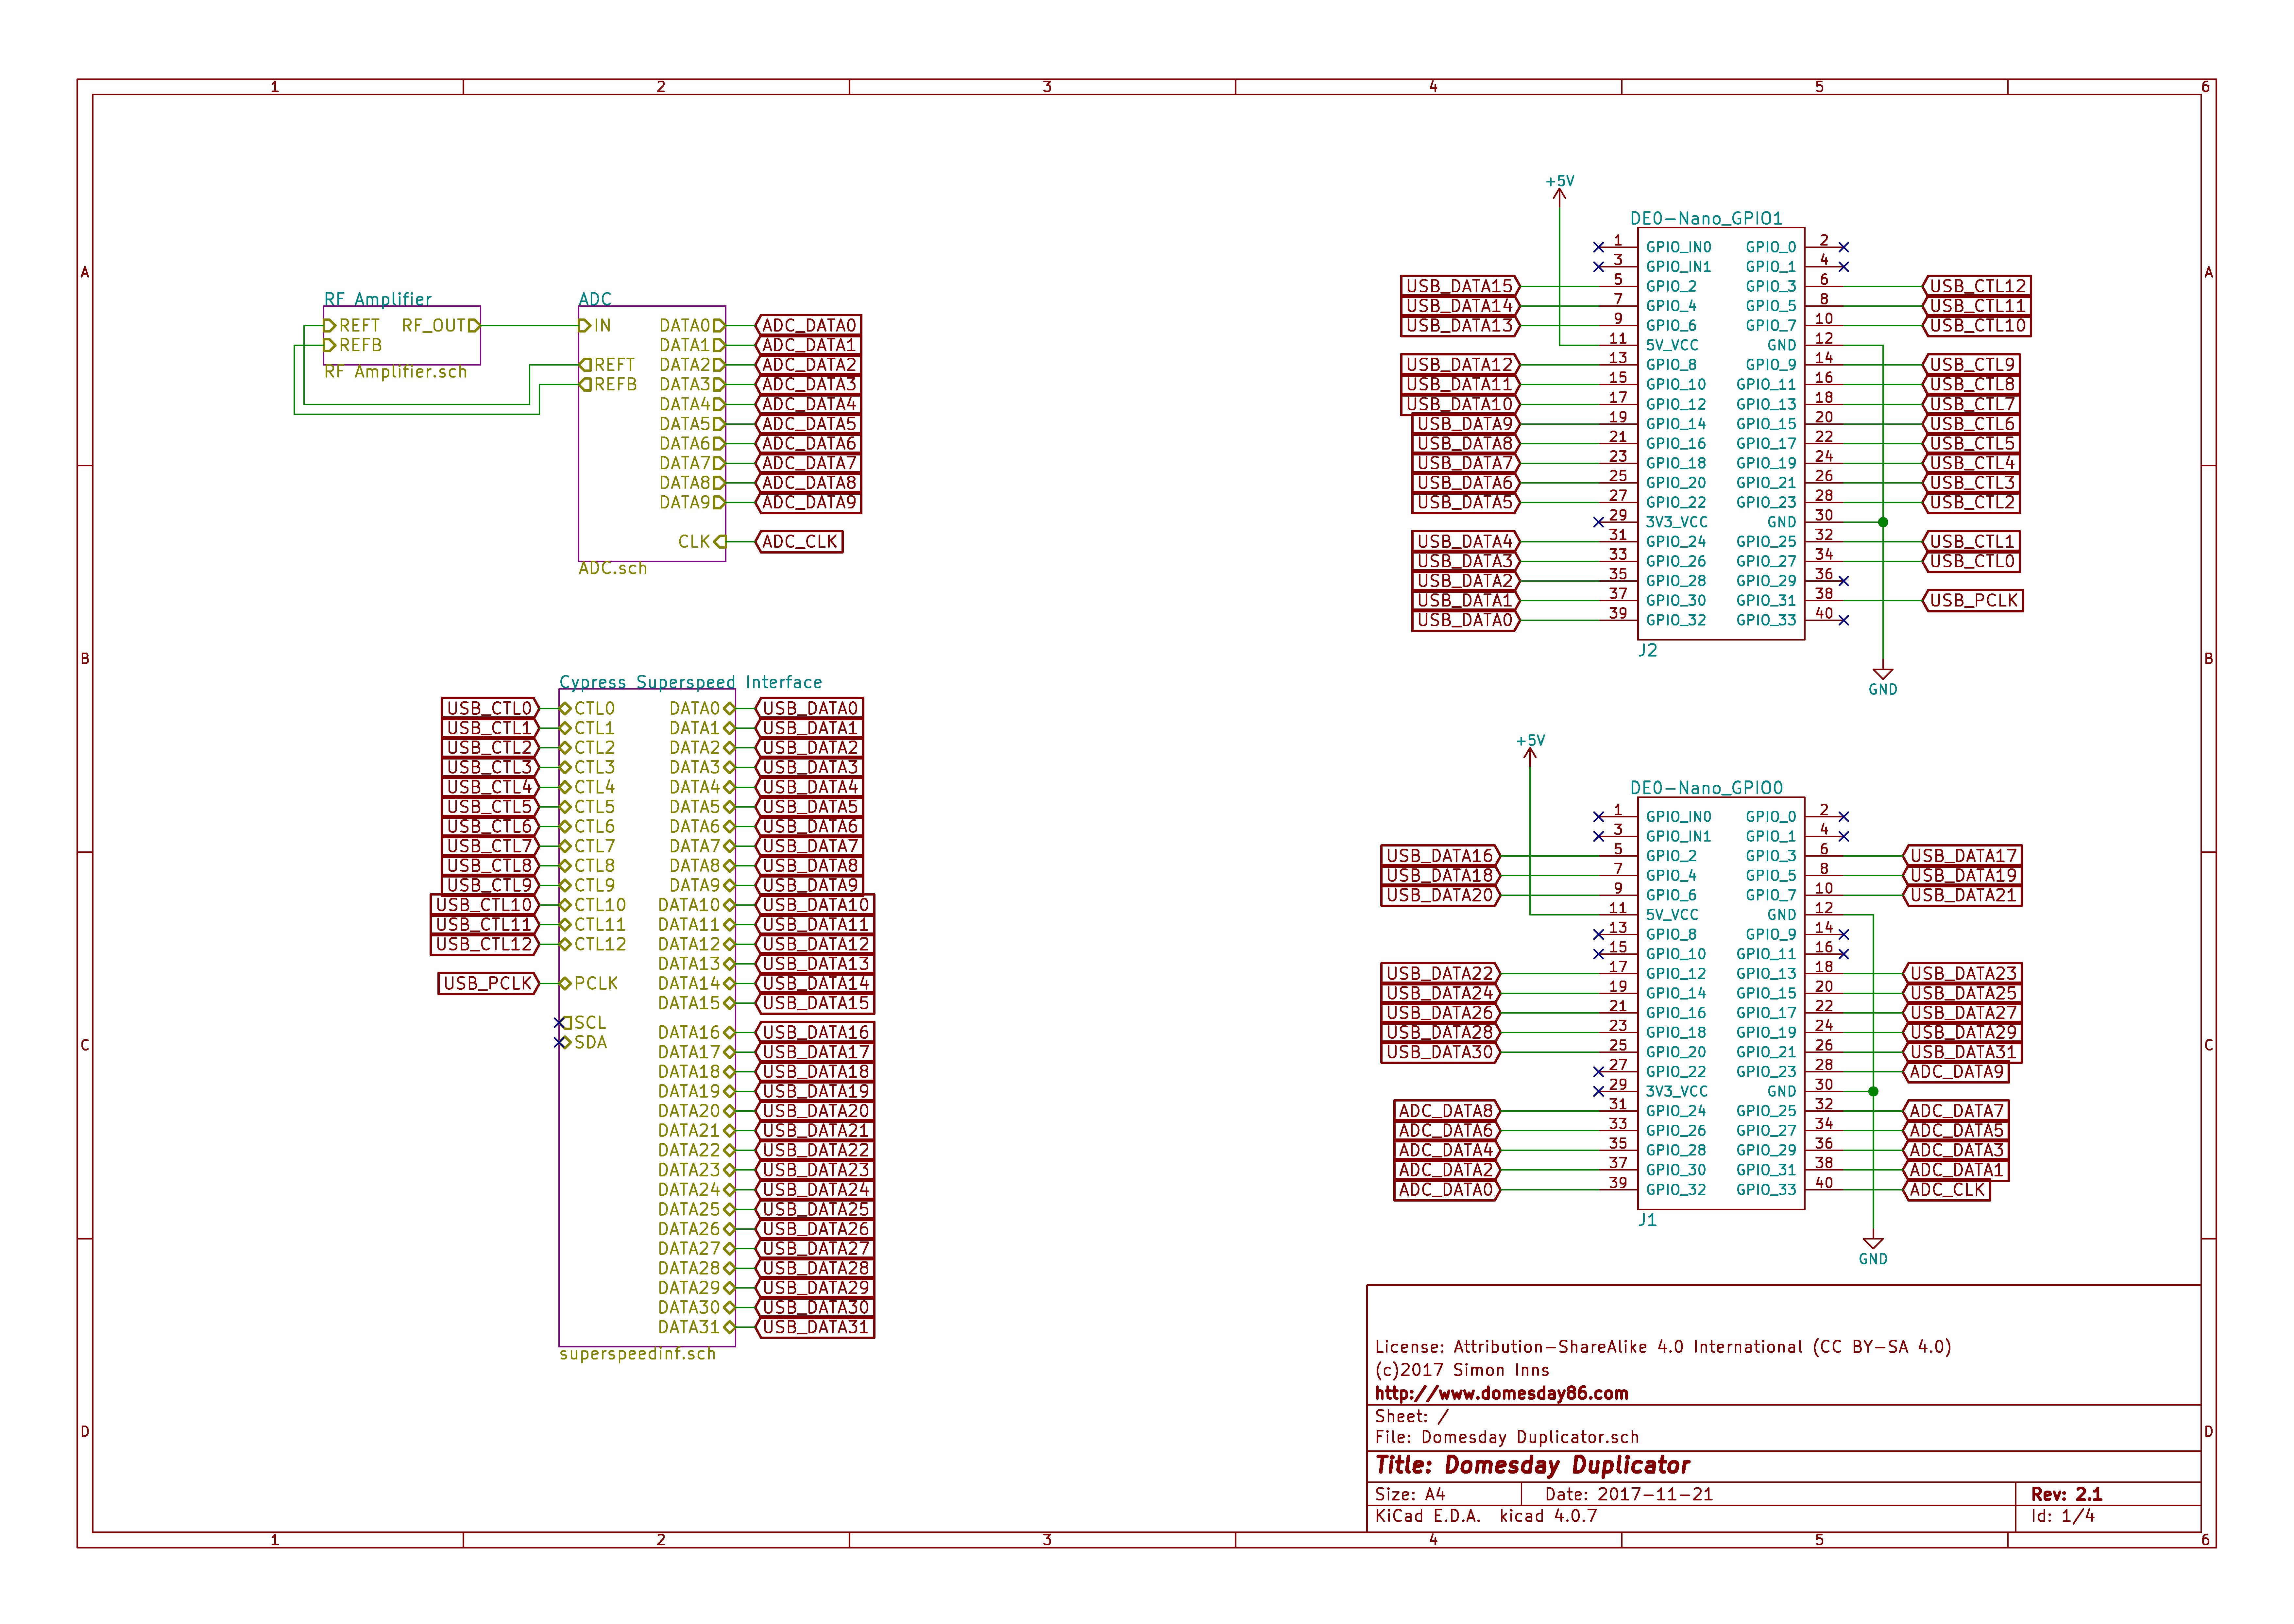 Domesday Duplicator Hardware 2 0 Usb Oscilloscope Schematic 1 Module Interconnection